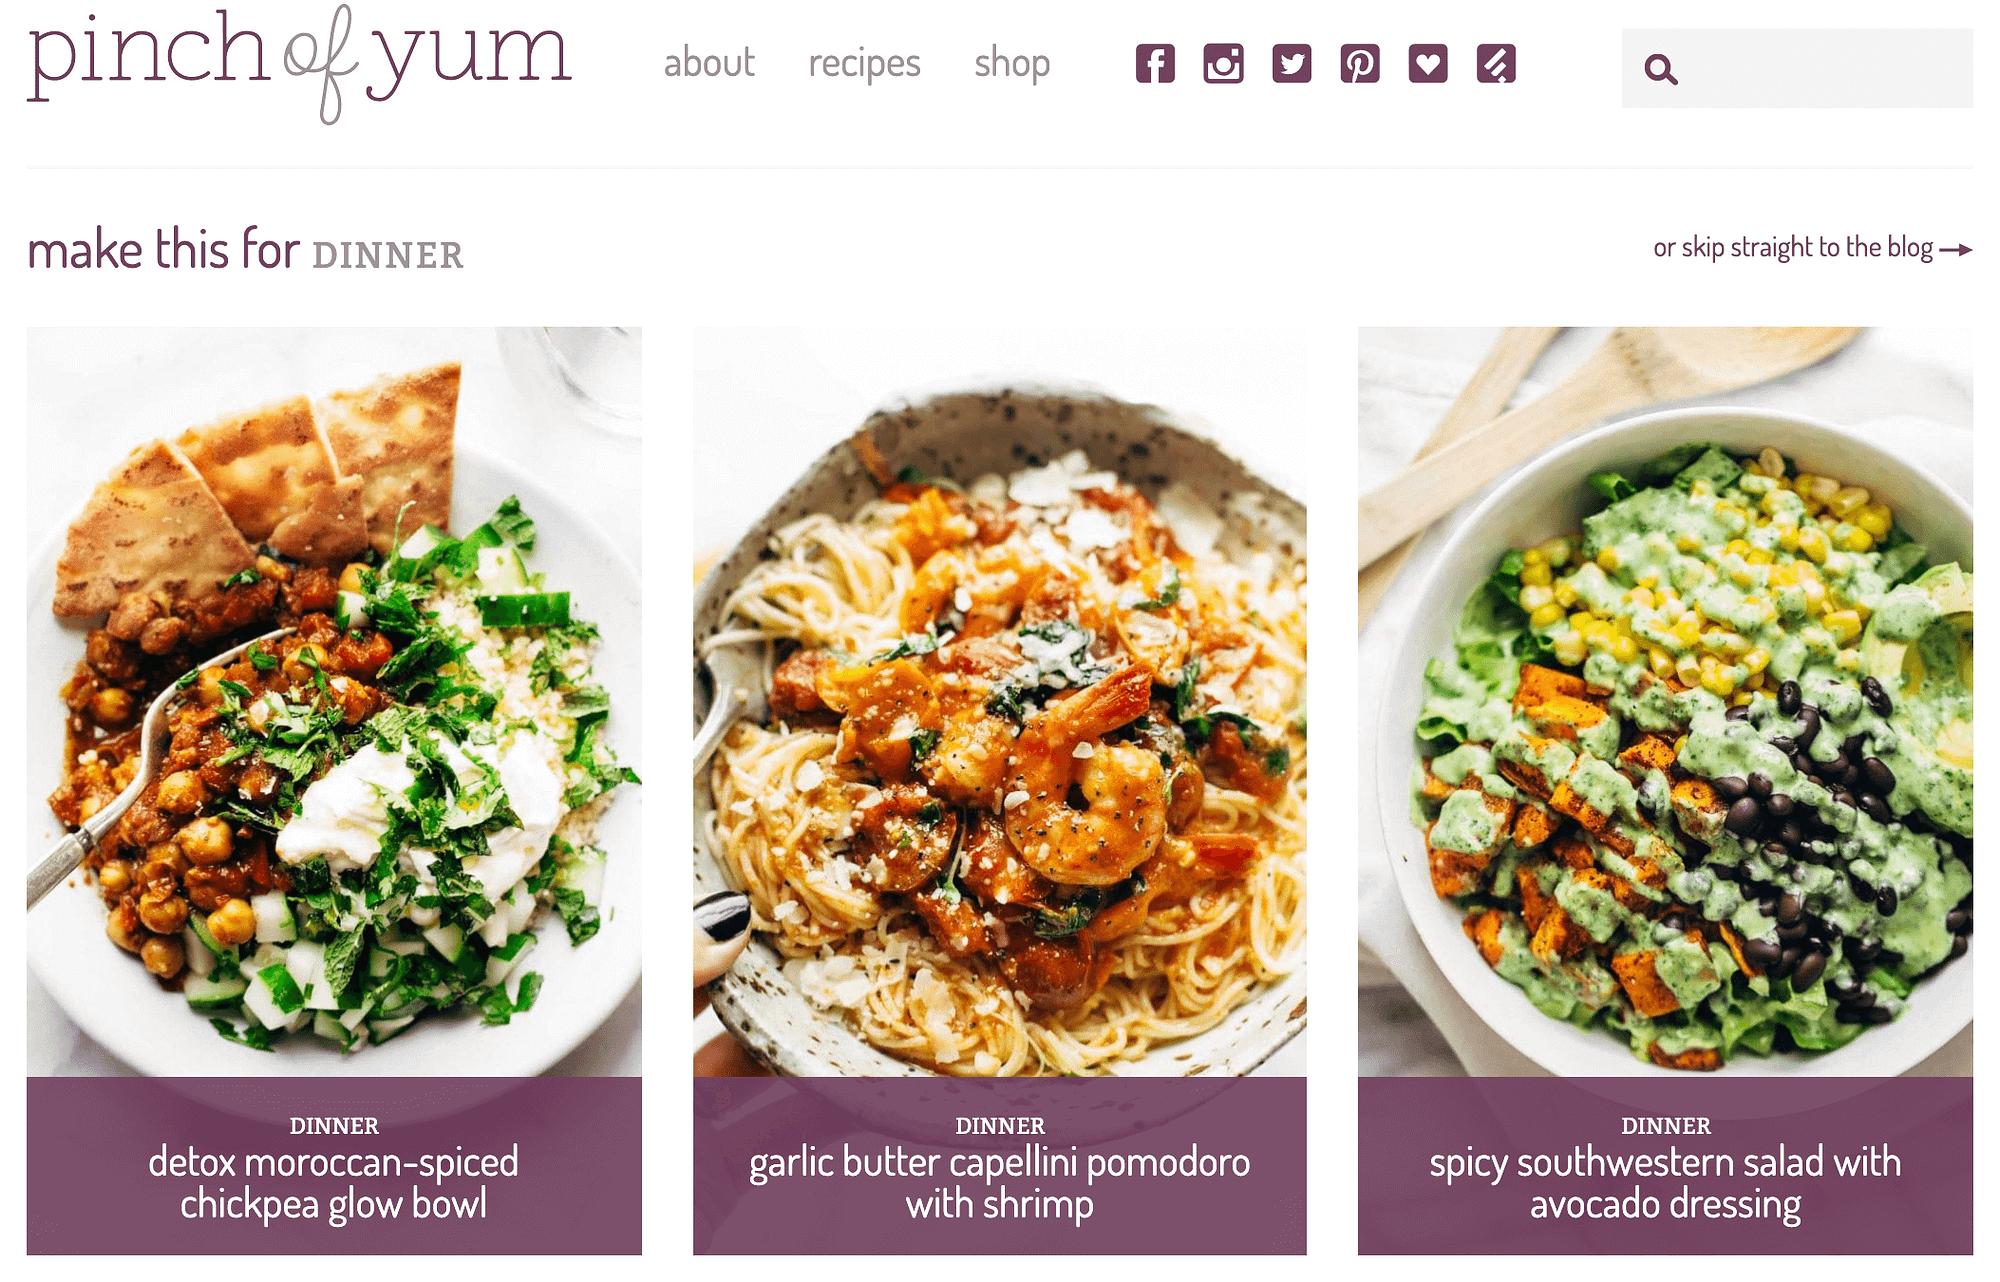 Blog de comida The Pinch of Yum.